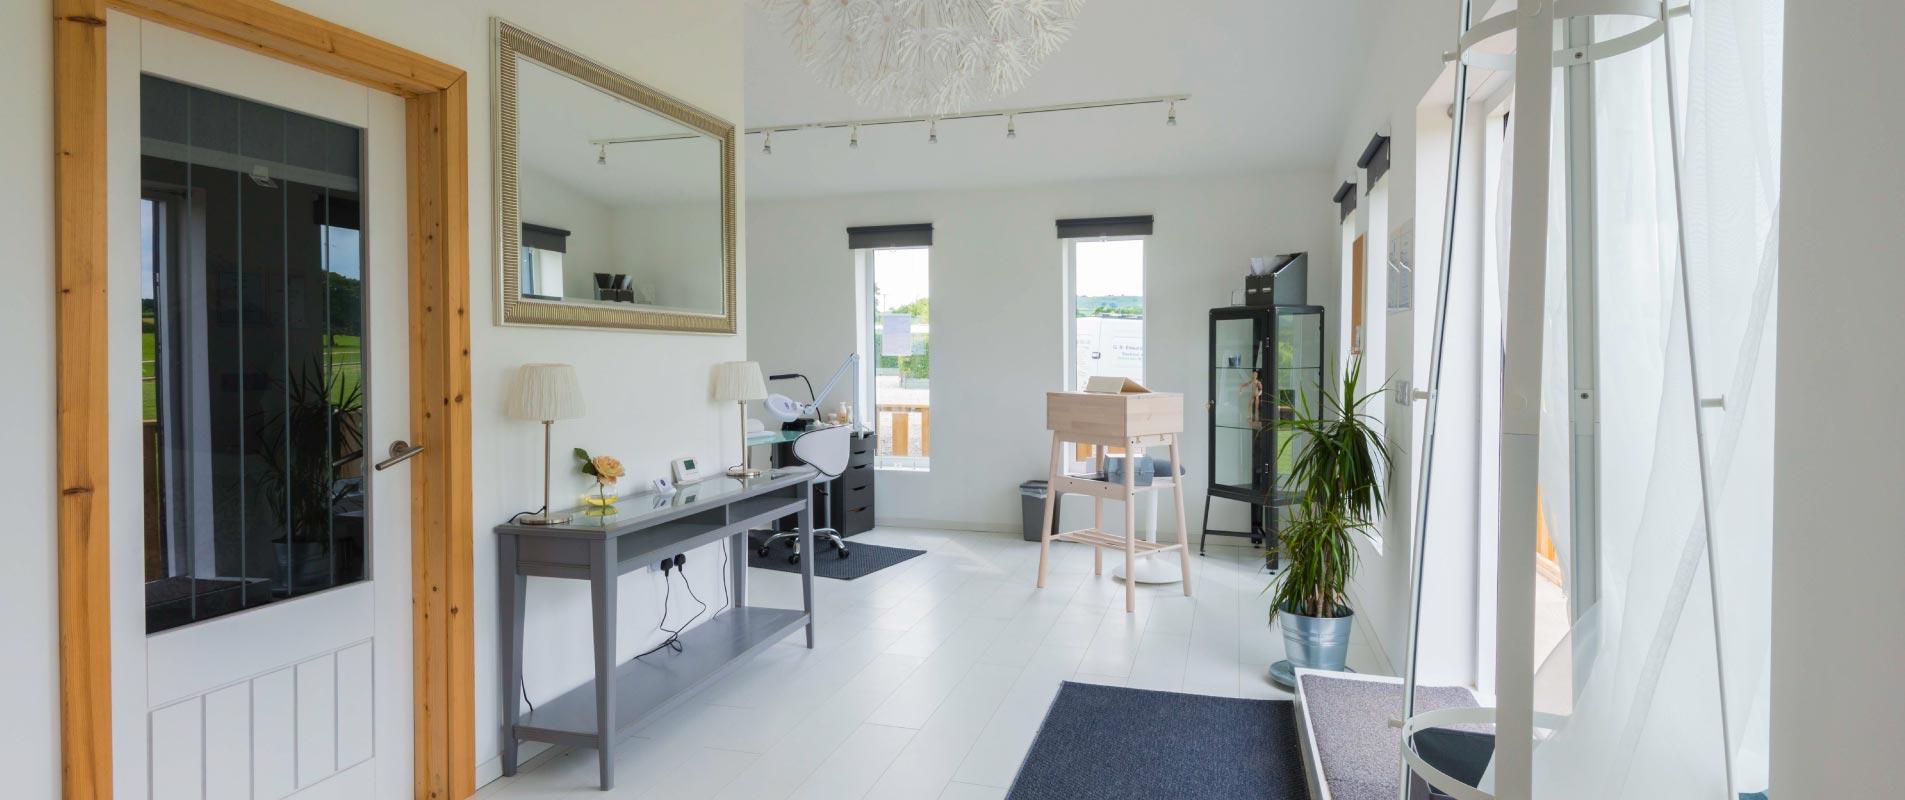 spa-treatment-room